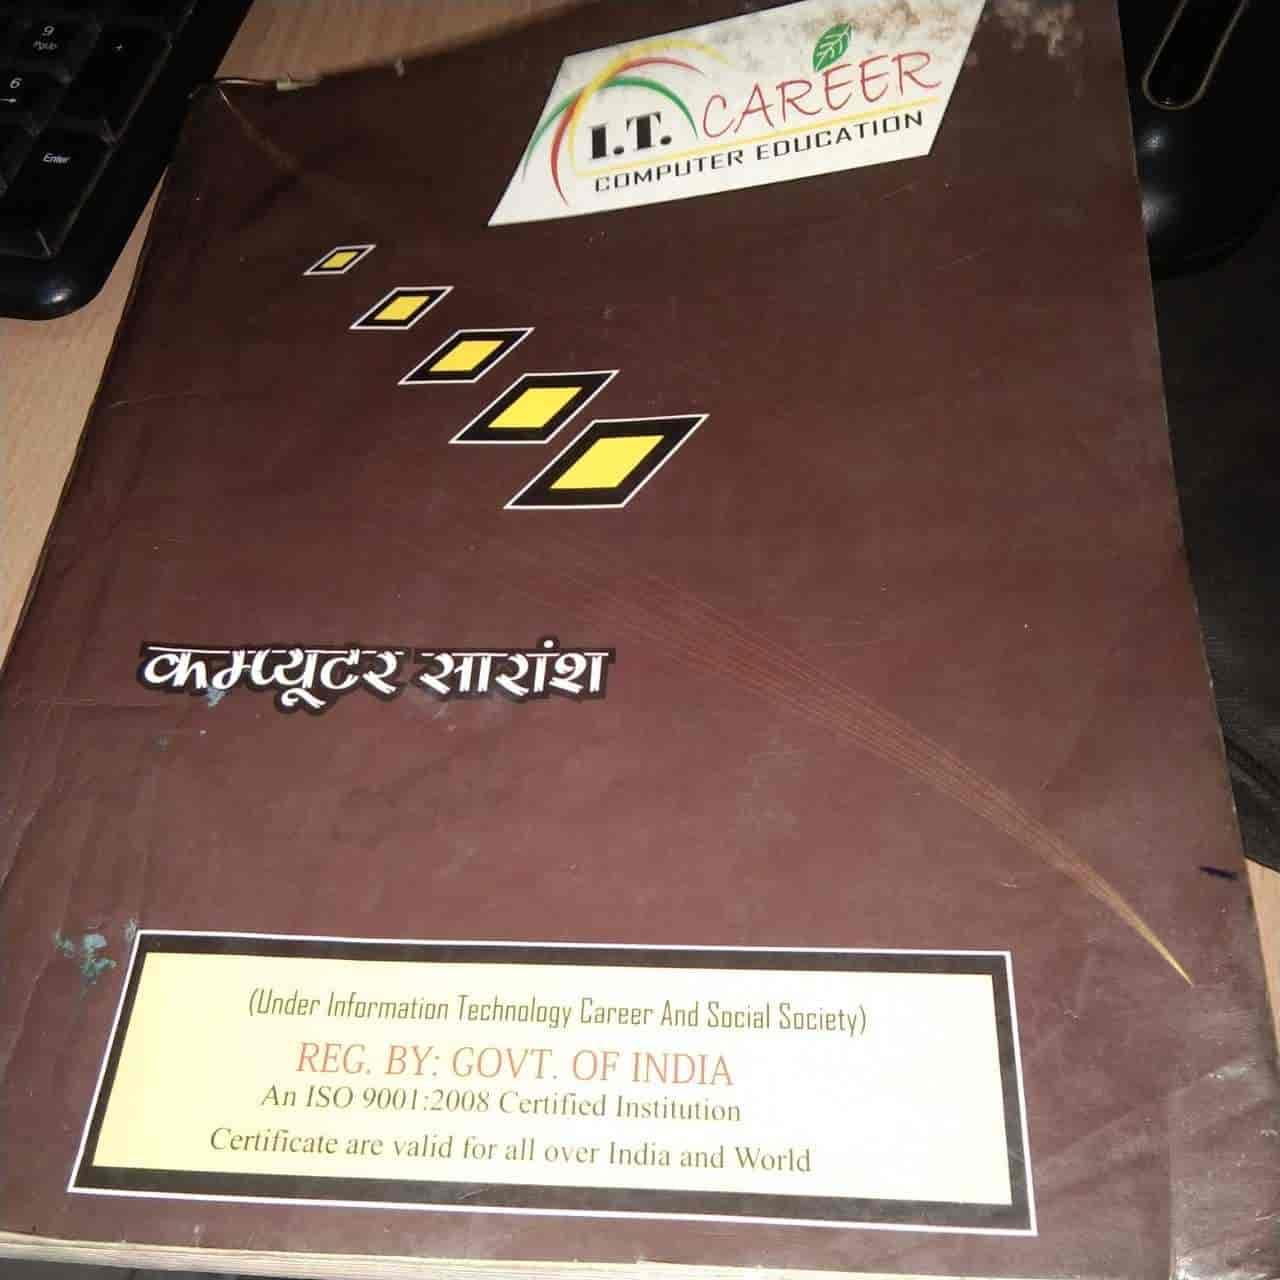 aa1c33eec0d JAIN BOOK DEPOT, Connaught Place - Book Distributors in Delhi - Justdial